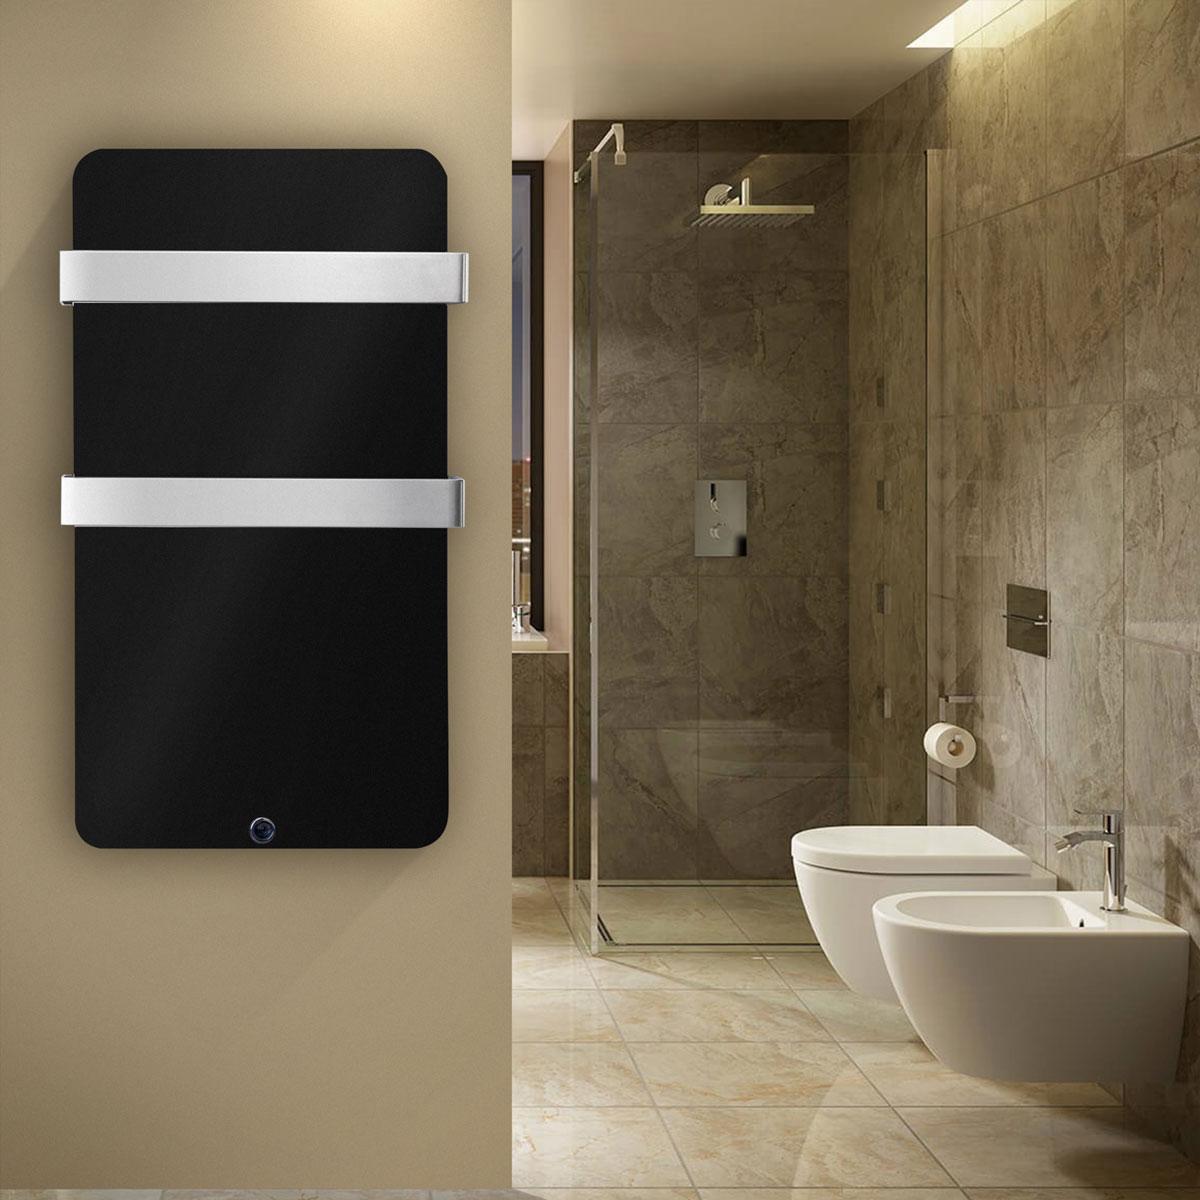 Blog - Bathroom Heaters: Style & Safety   Heatingpoint